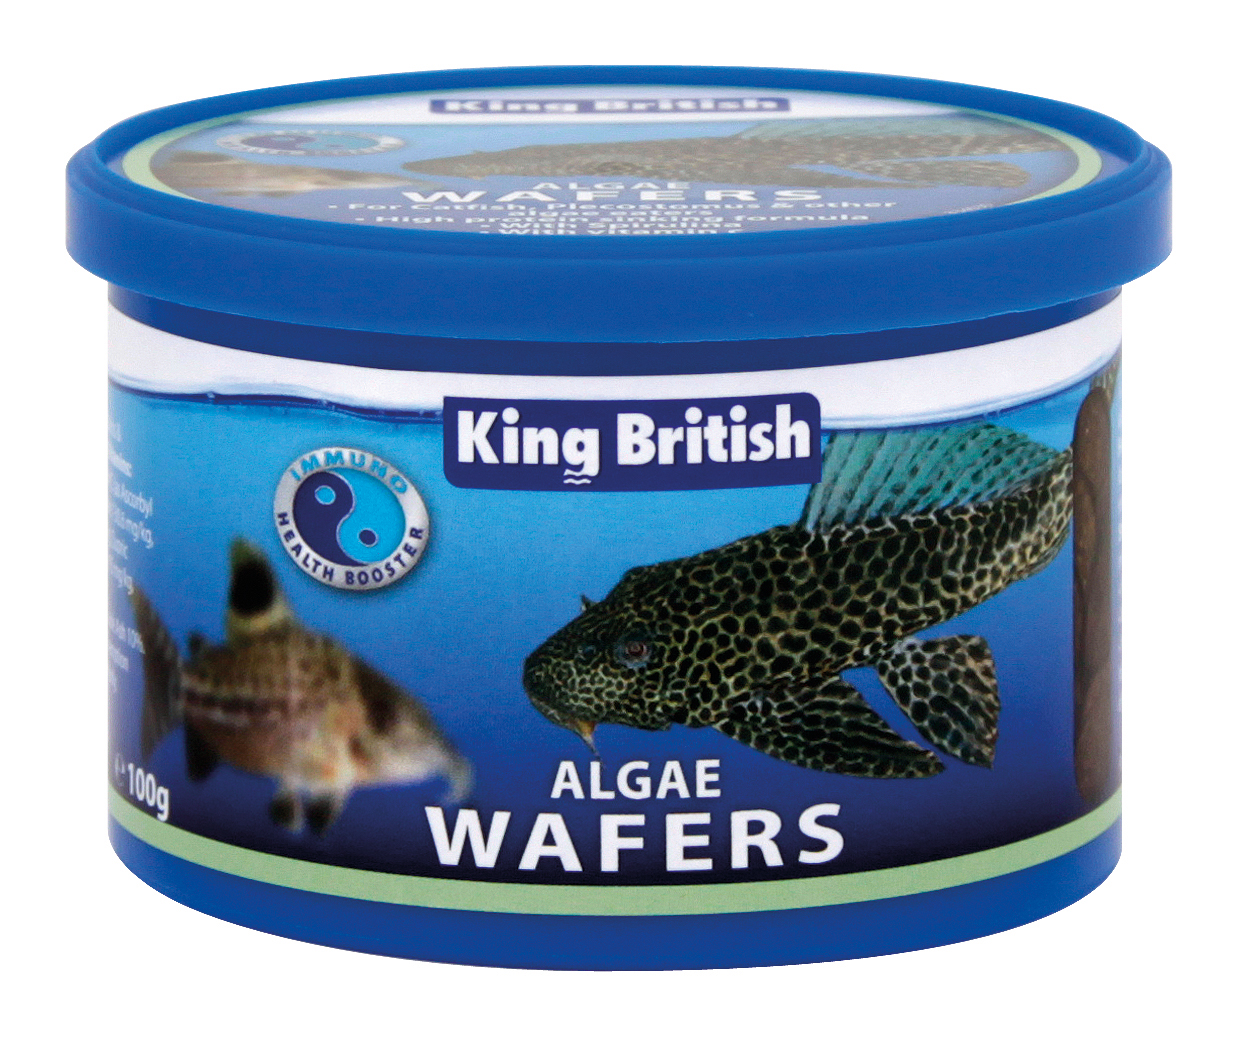 King british algae wafers aquarium fish food for Freshwater fish food